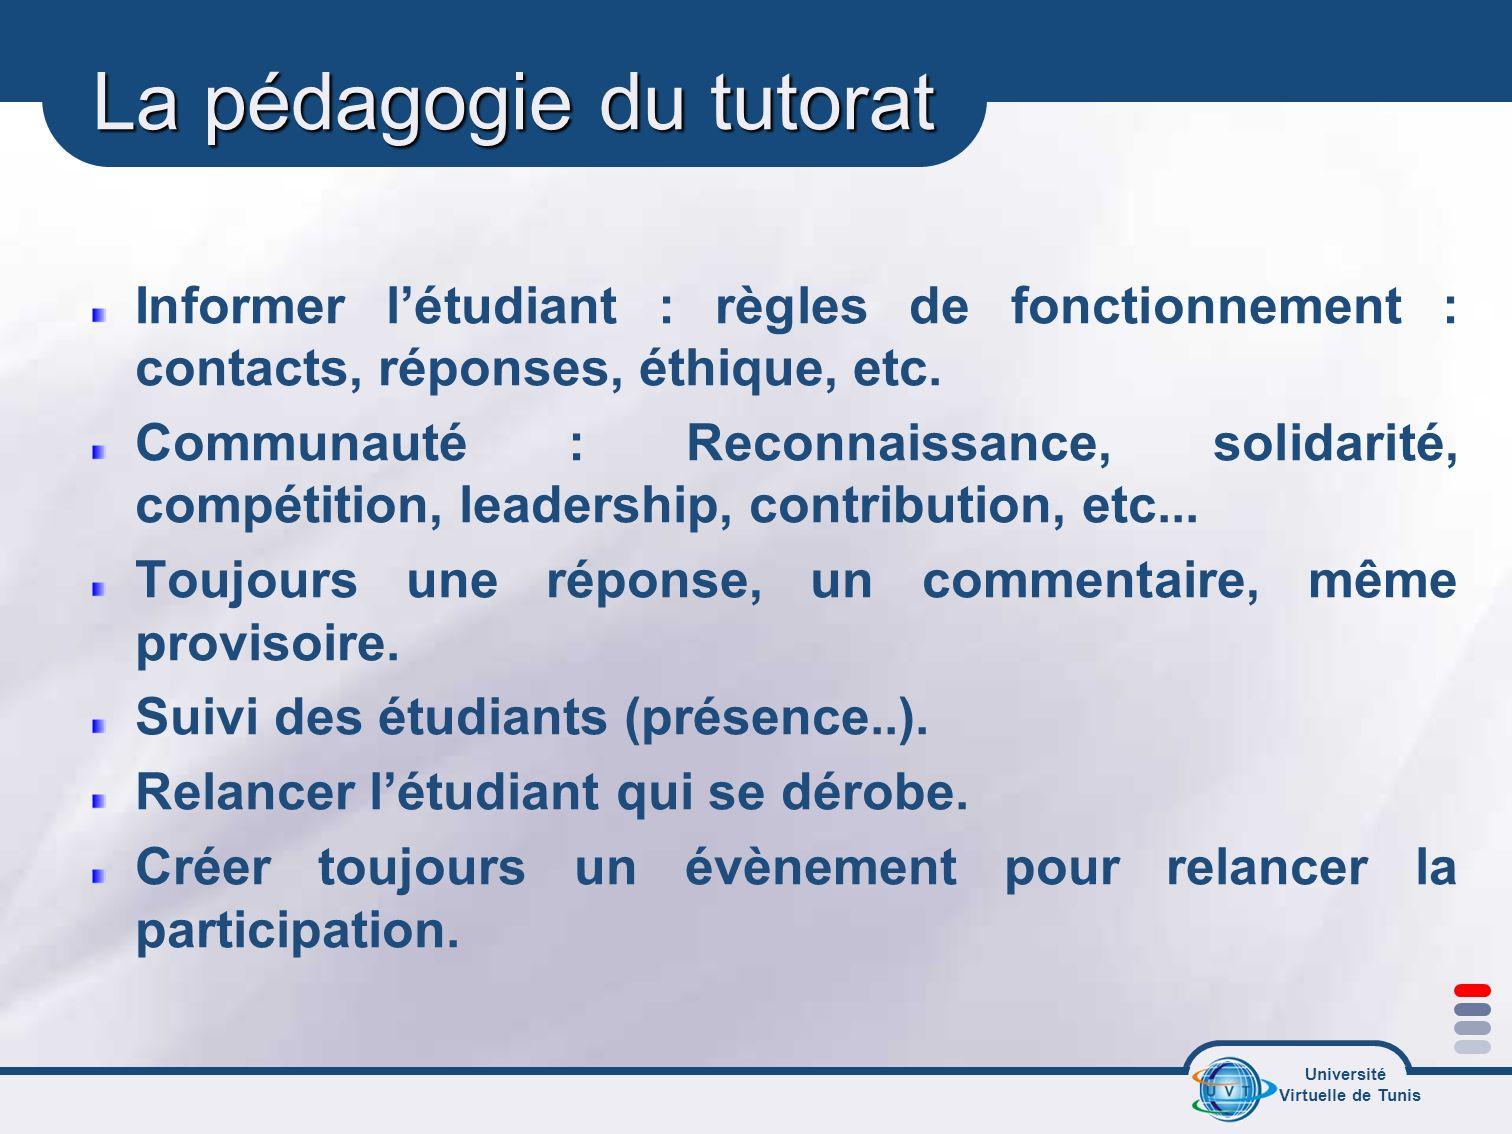 La pédagogie du tutorat